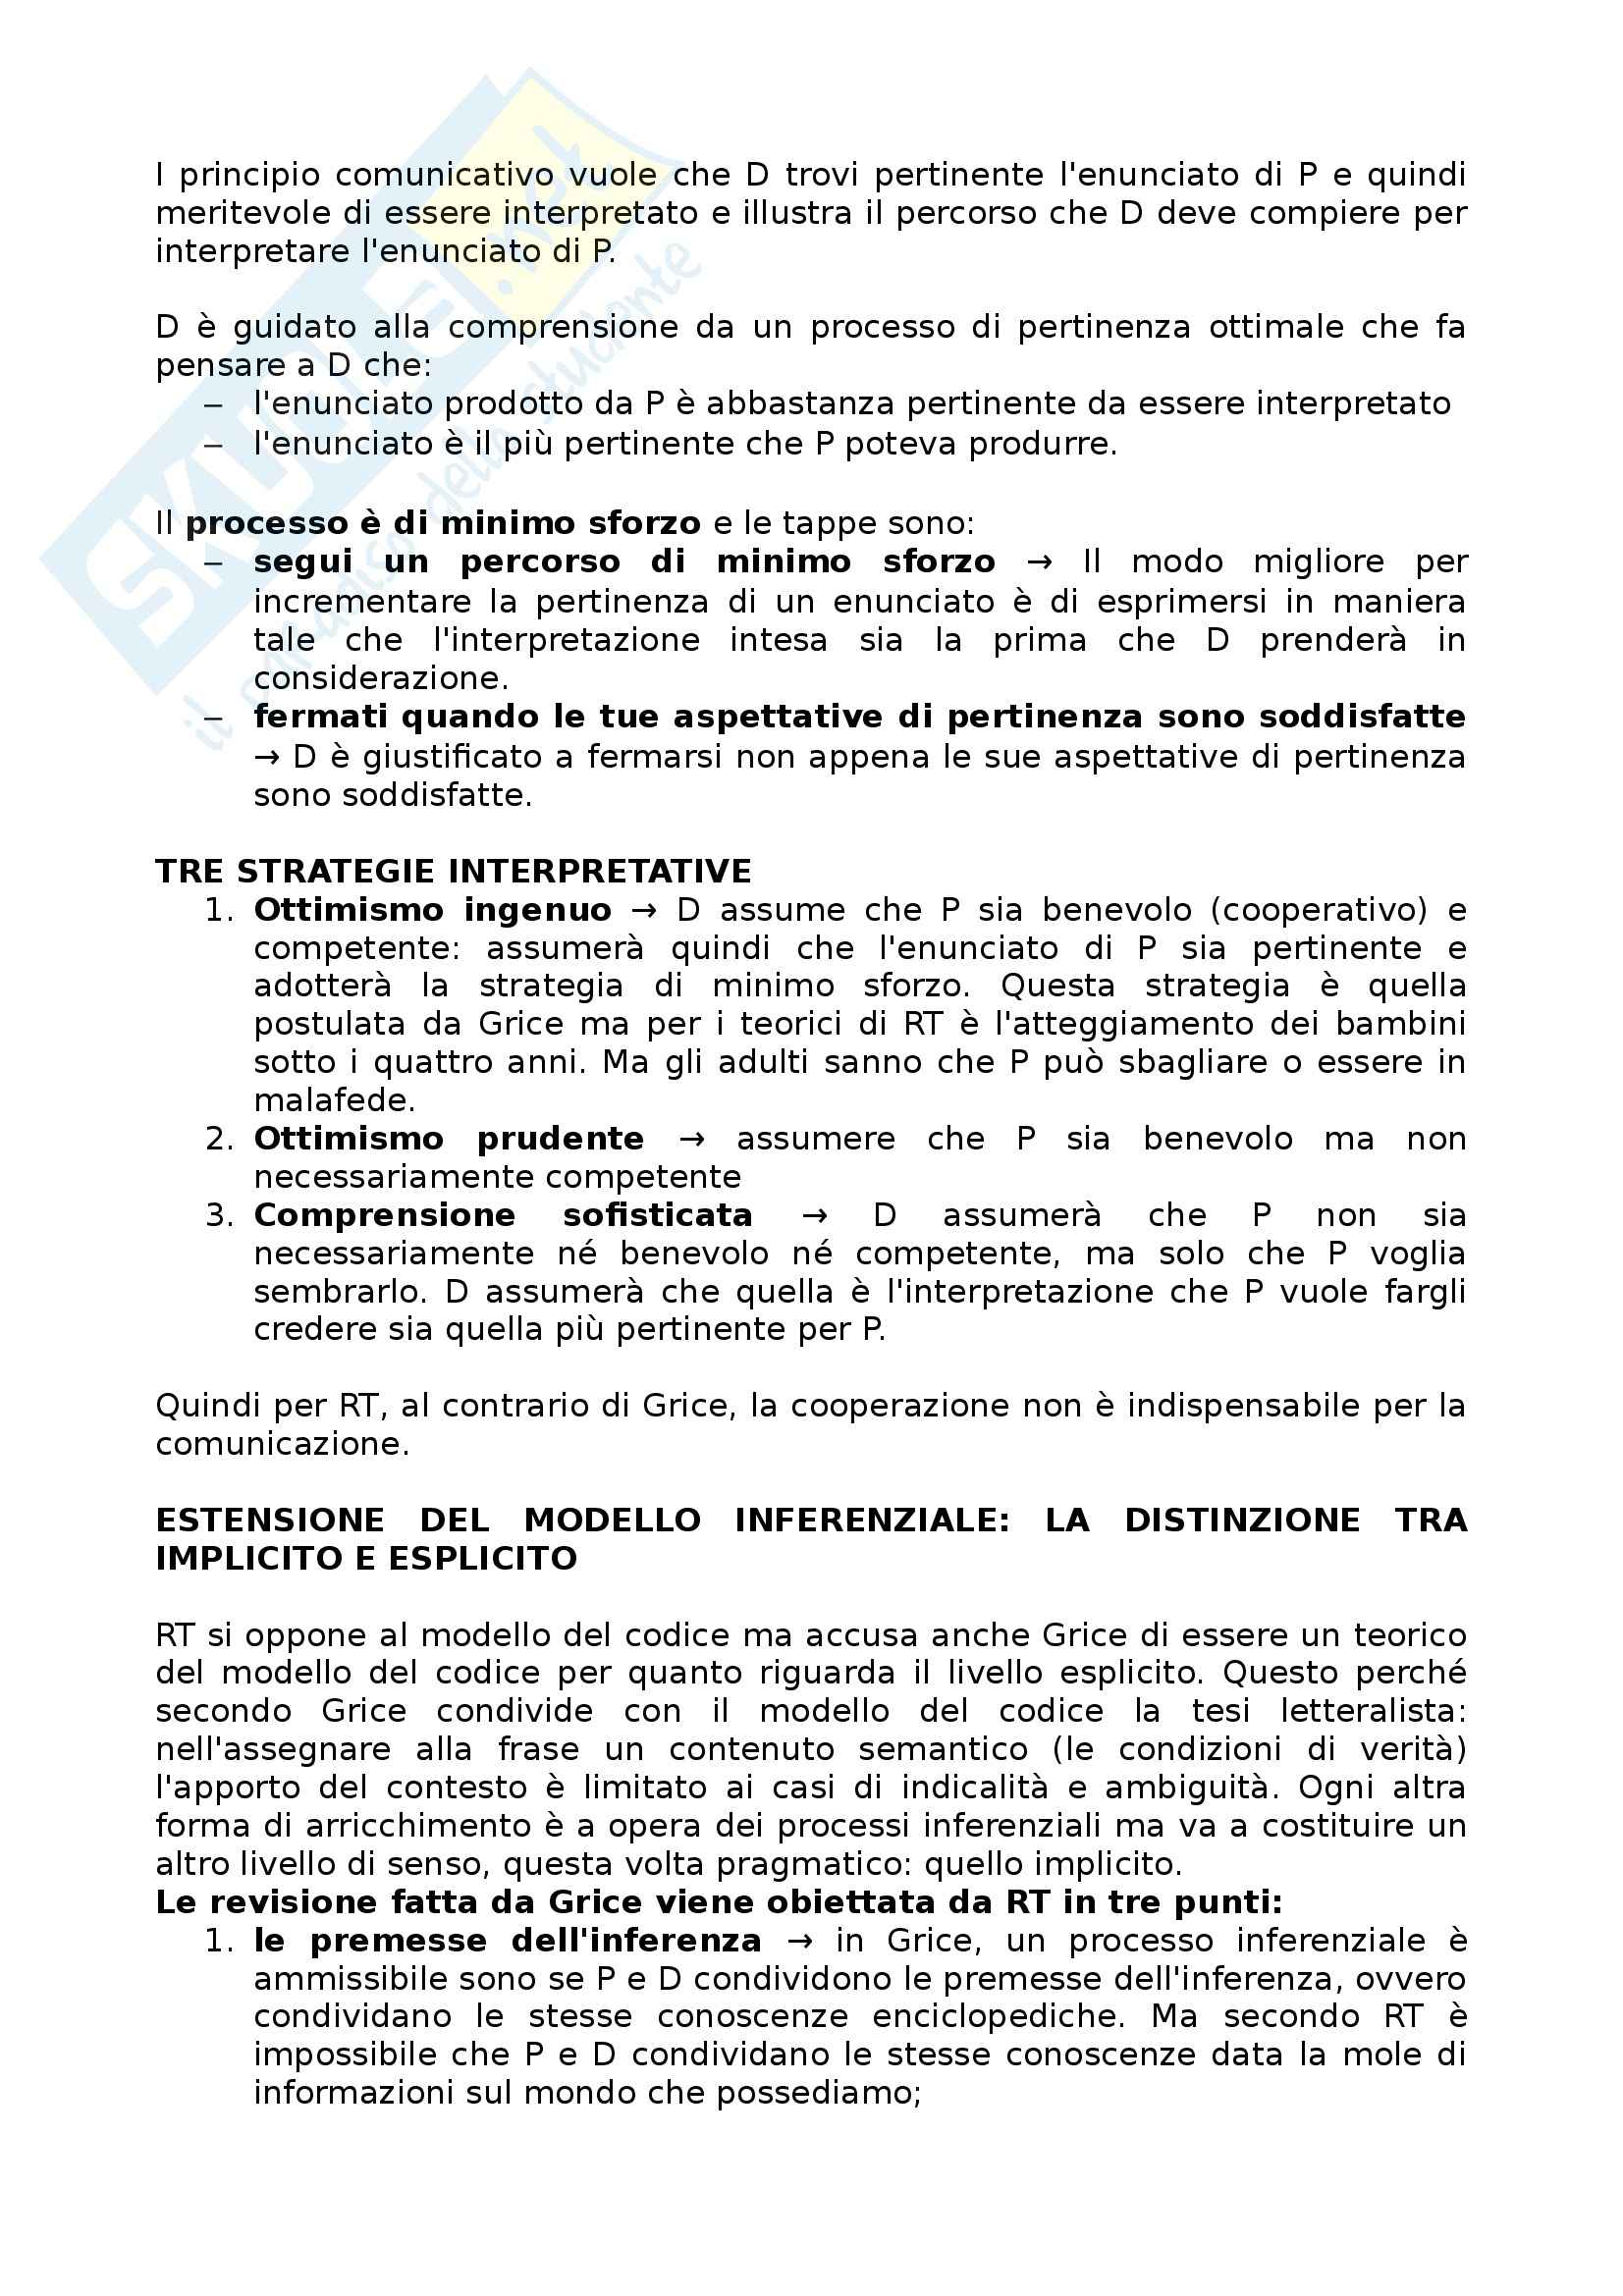 Riassunto esame Semiotica, prof. Calabi, libro consigliato Pragmatica Cognitiva, Bianchi Pag. 16